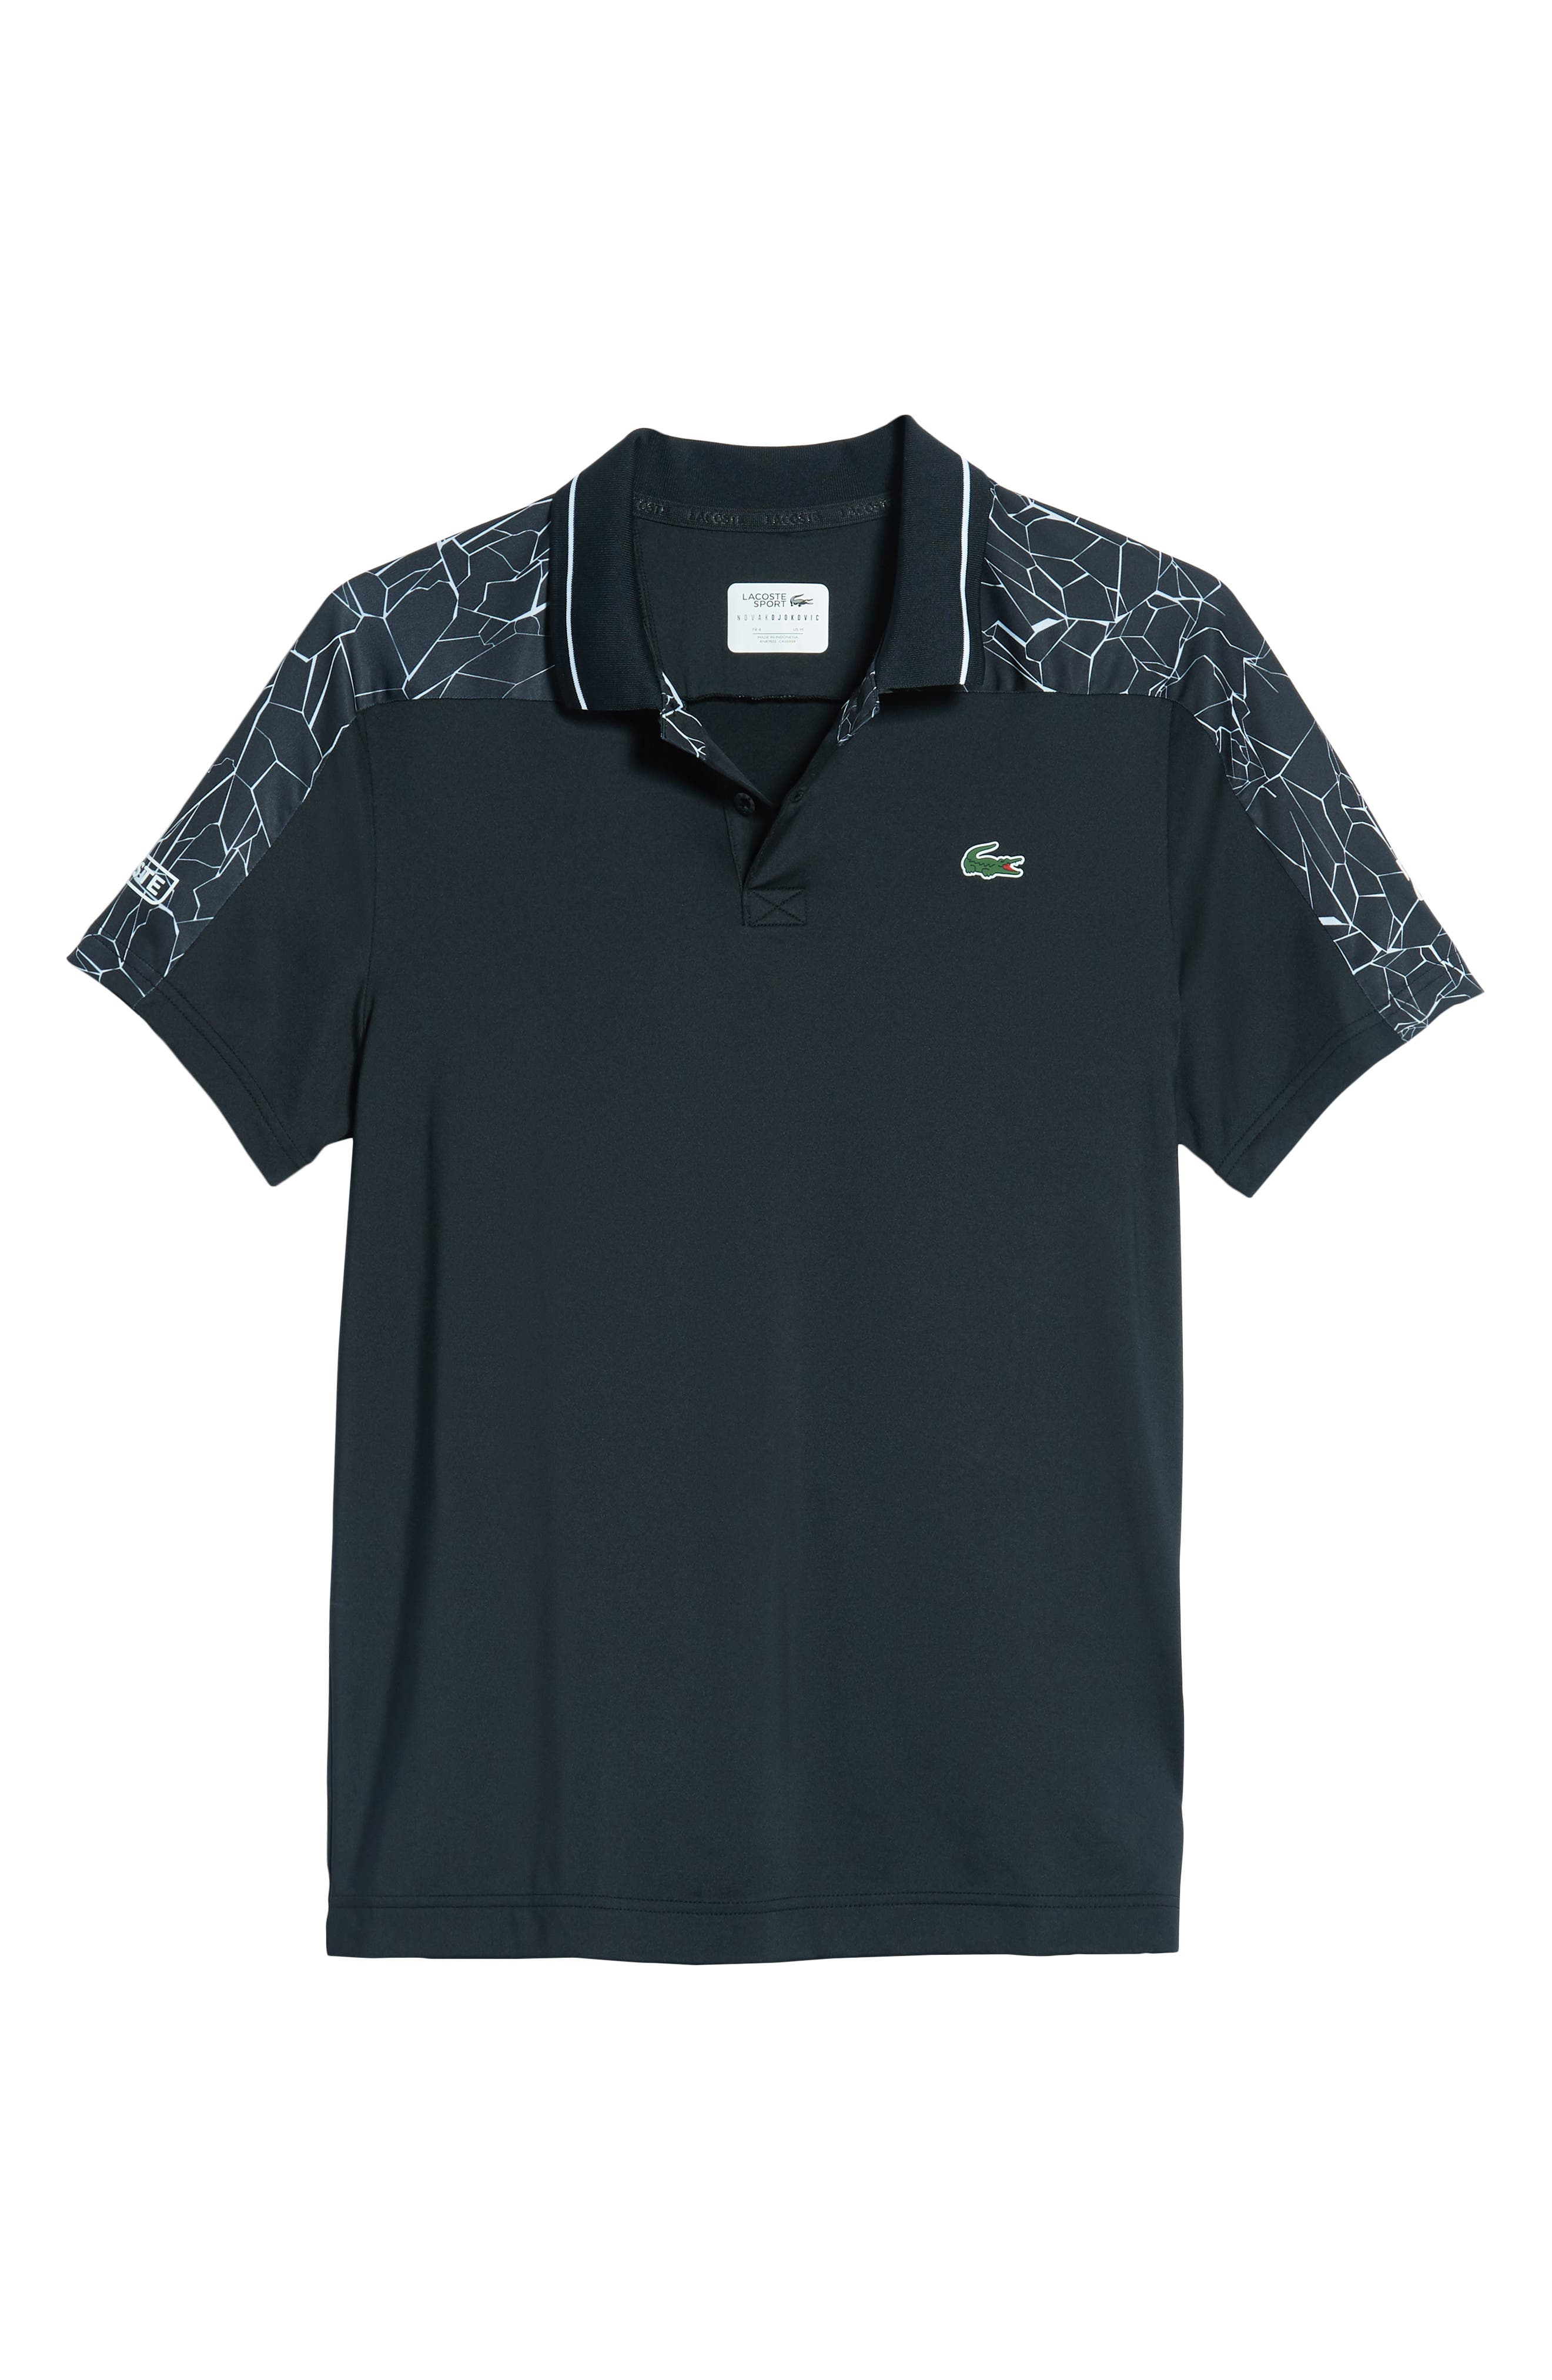 Regular Fit Novak Djokovic Ultra Dry Polo,                             Alternate thumbnail 6, color,                             BLACK/ WHITE